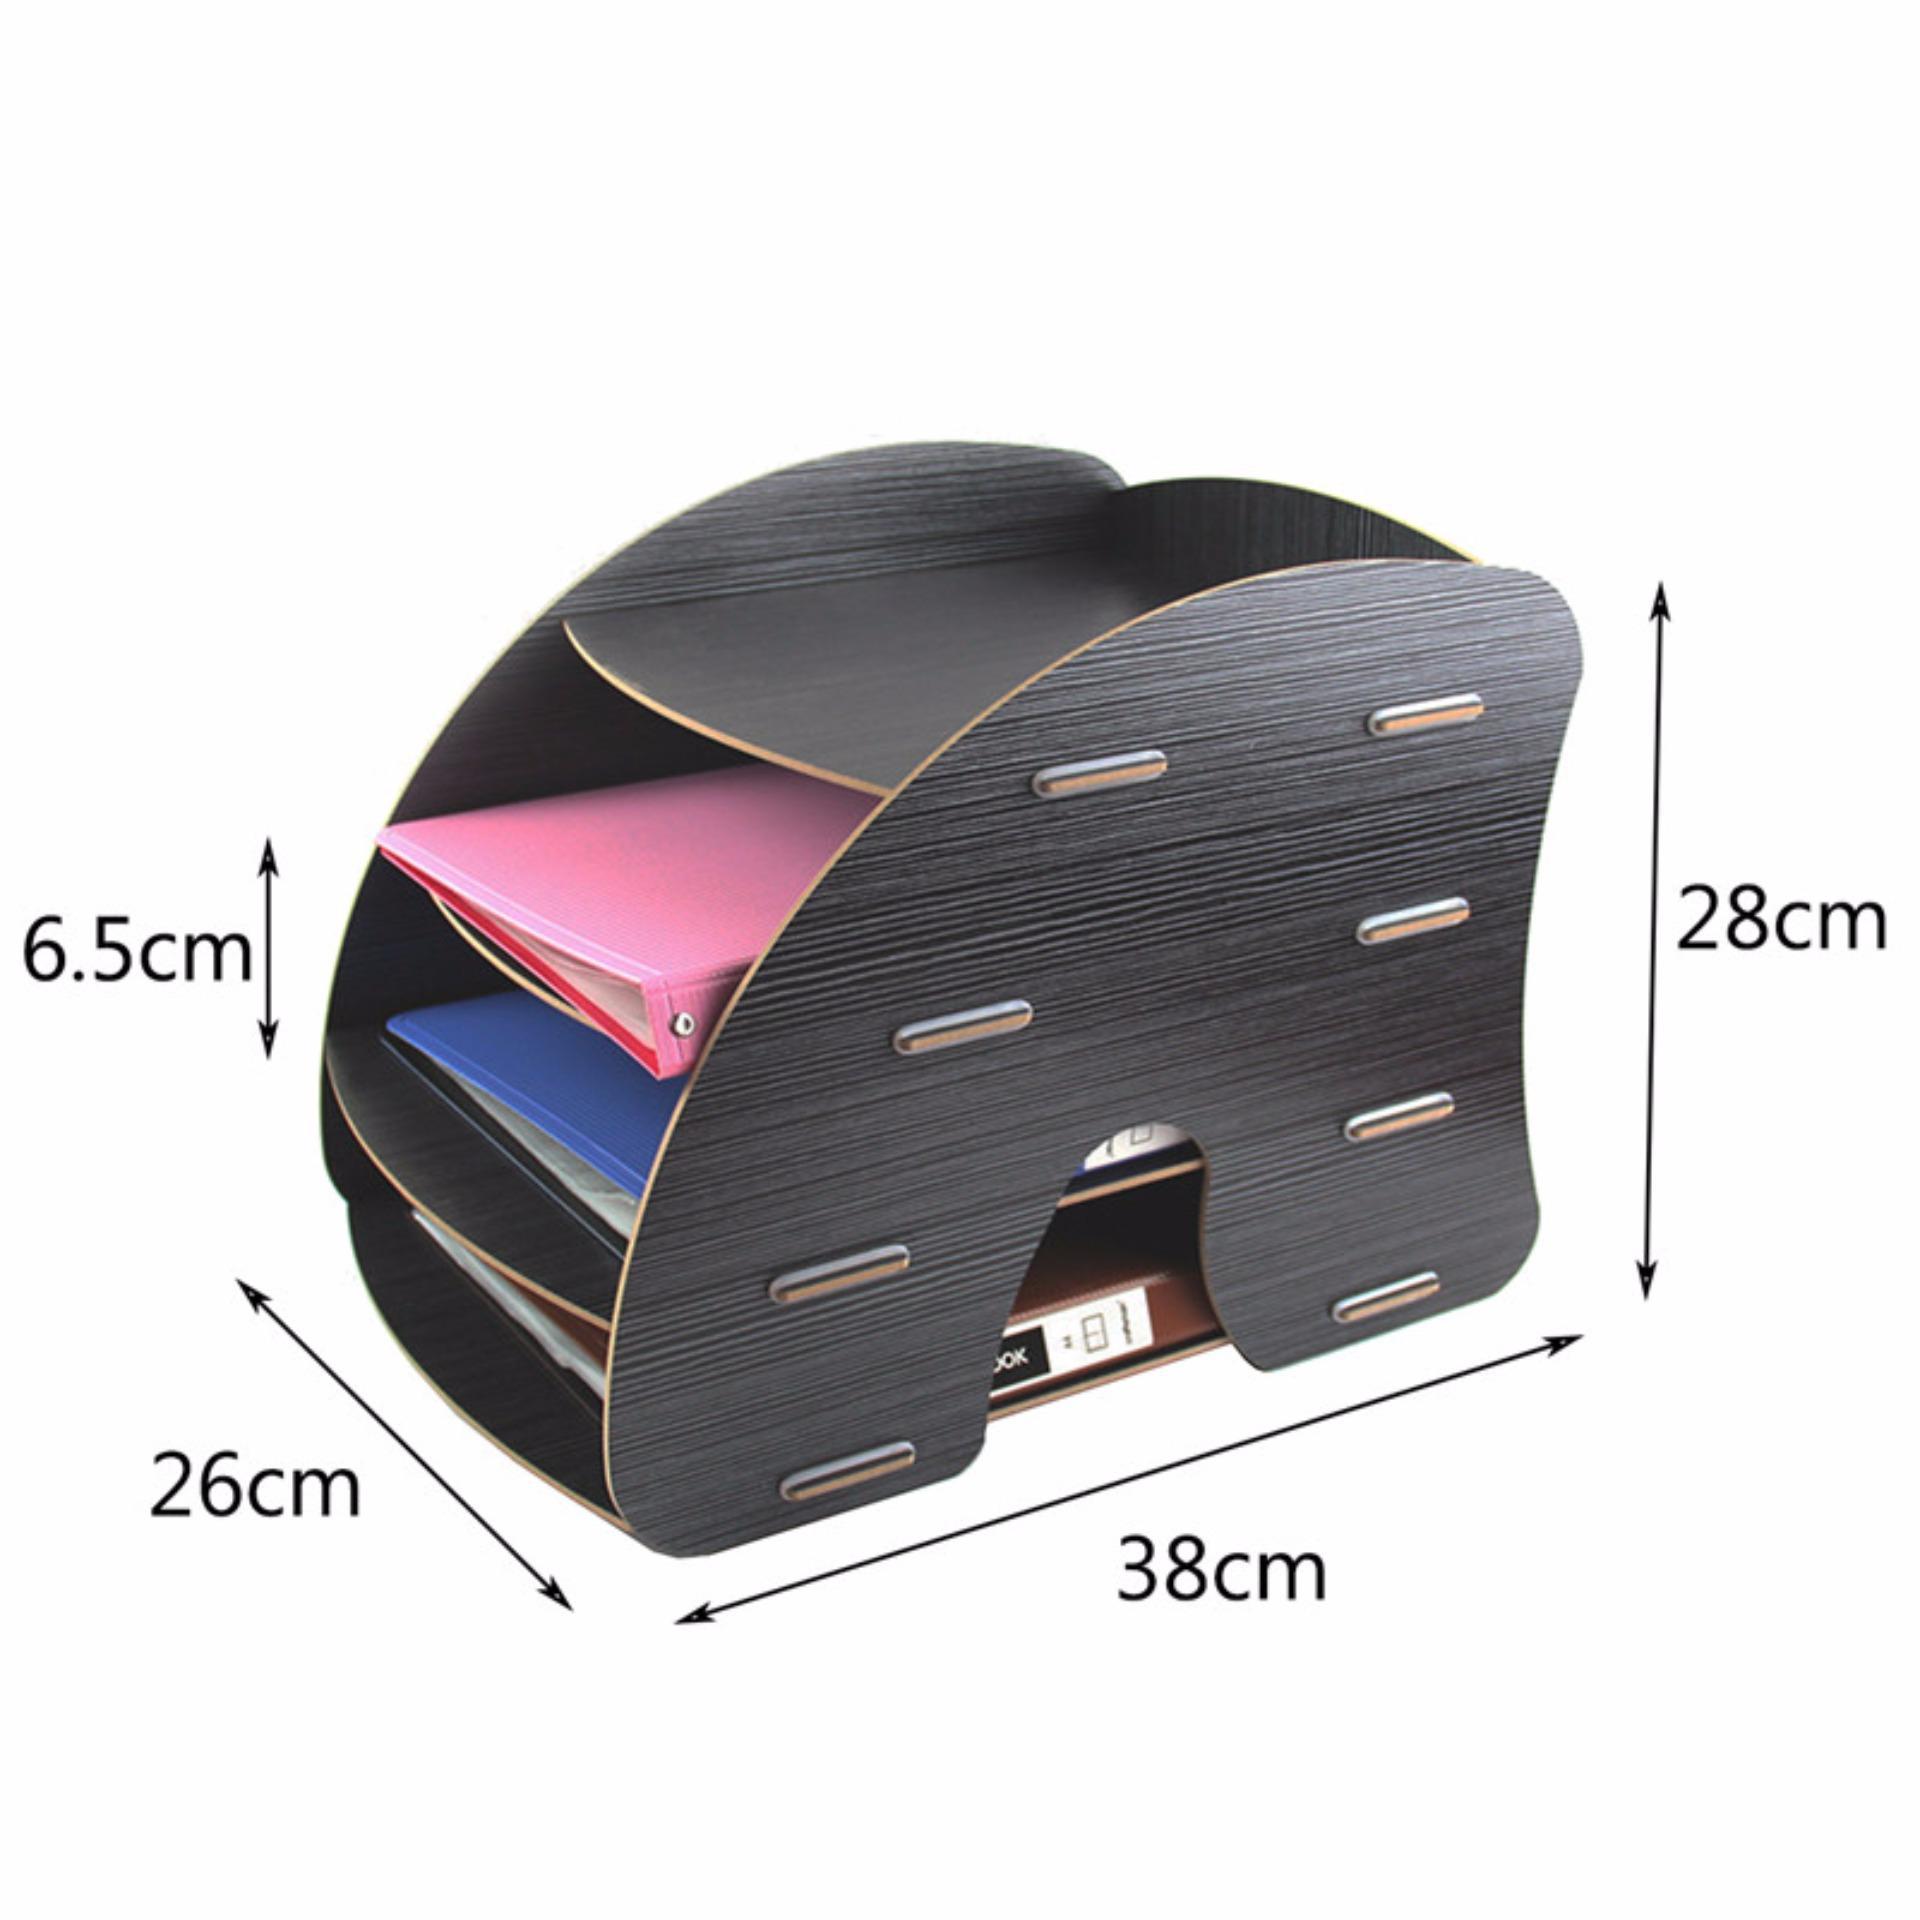 4 Tier Detachable Wooden Grain Design Desk A4 File Letter Storagetray Desktop Cabinet Box Case Office